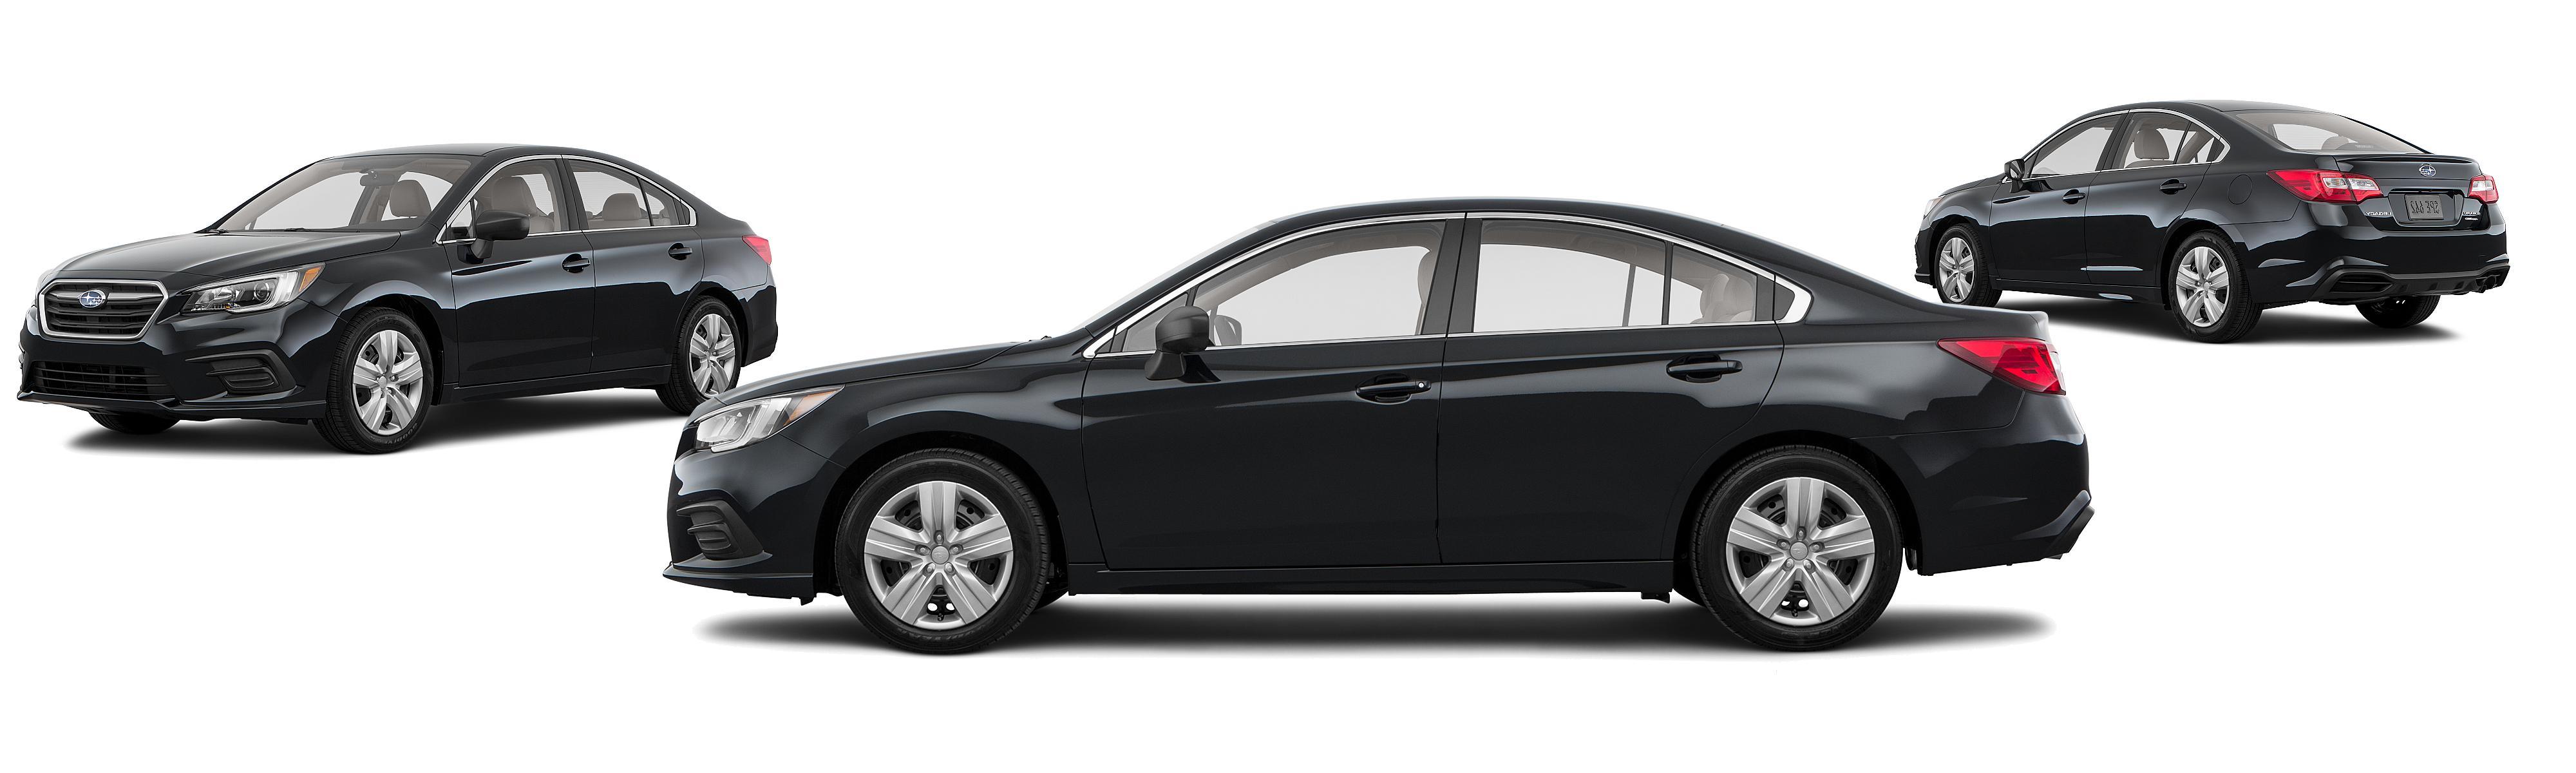 Subaru Legacy: California proposition 65 warning